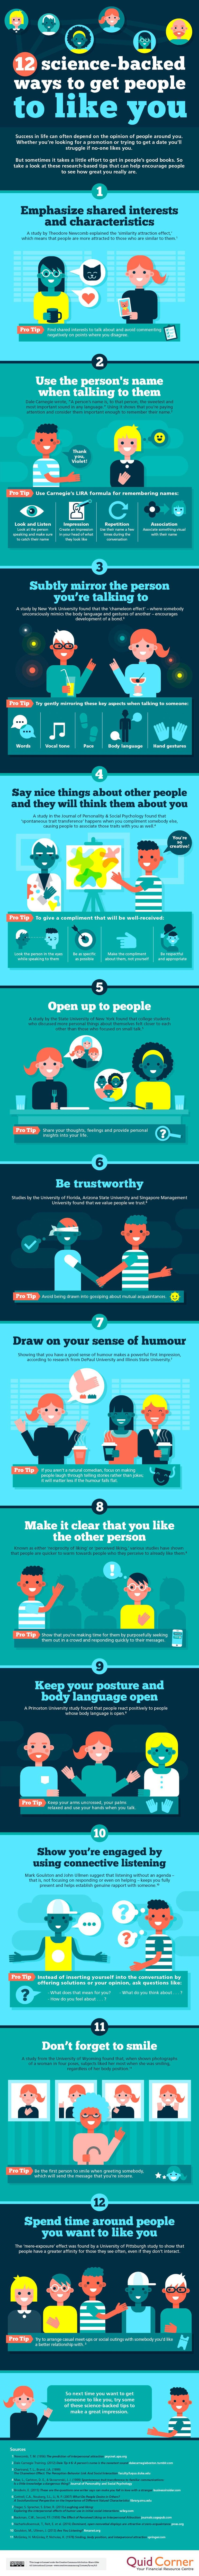 https://assets.entrepreneur.com/images/misc/1533823292_get-people-to-like-you-infographic.jpg